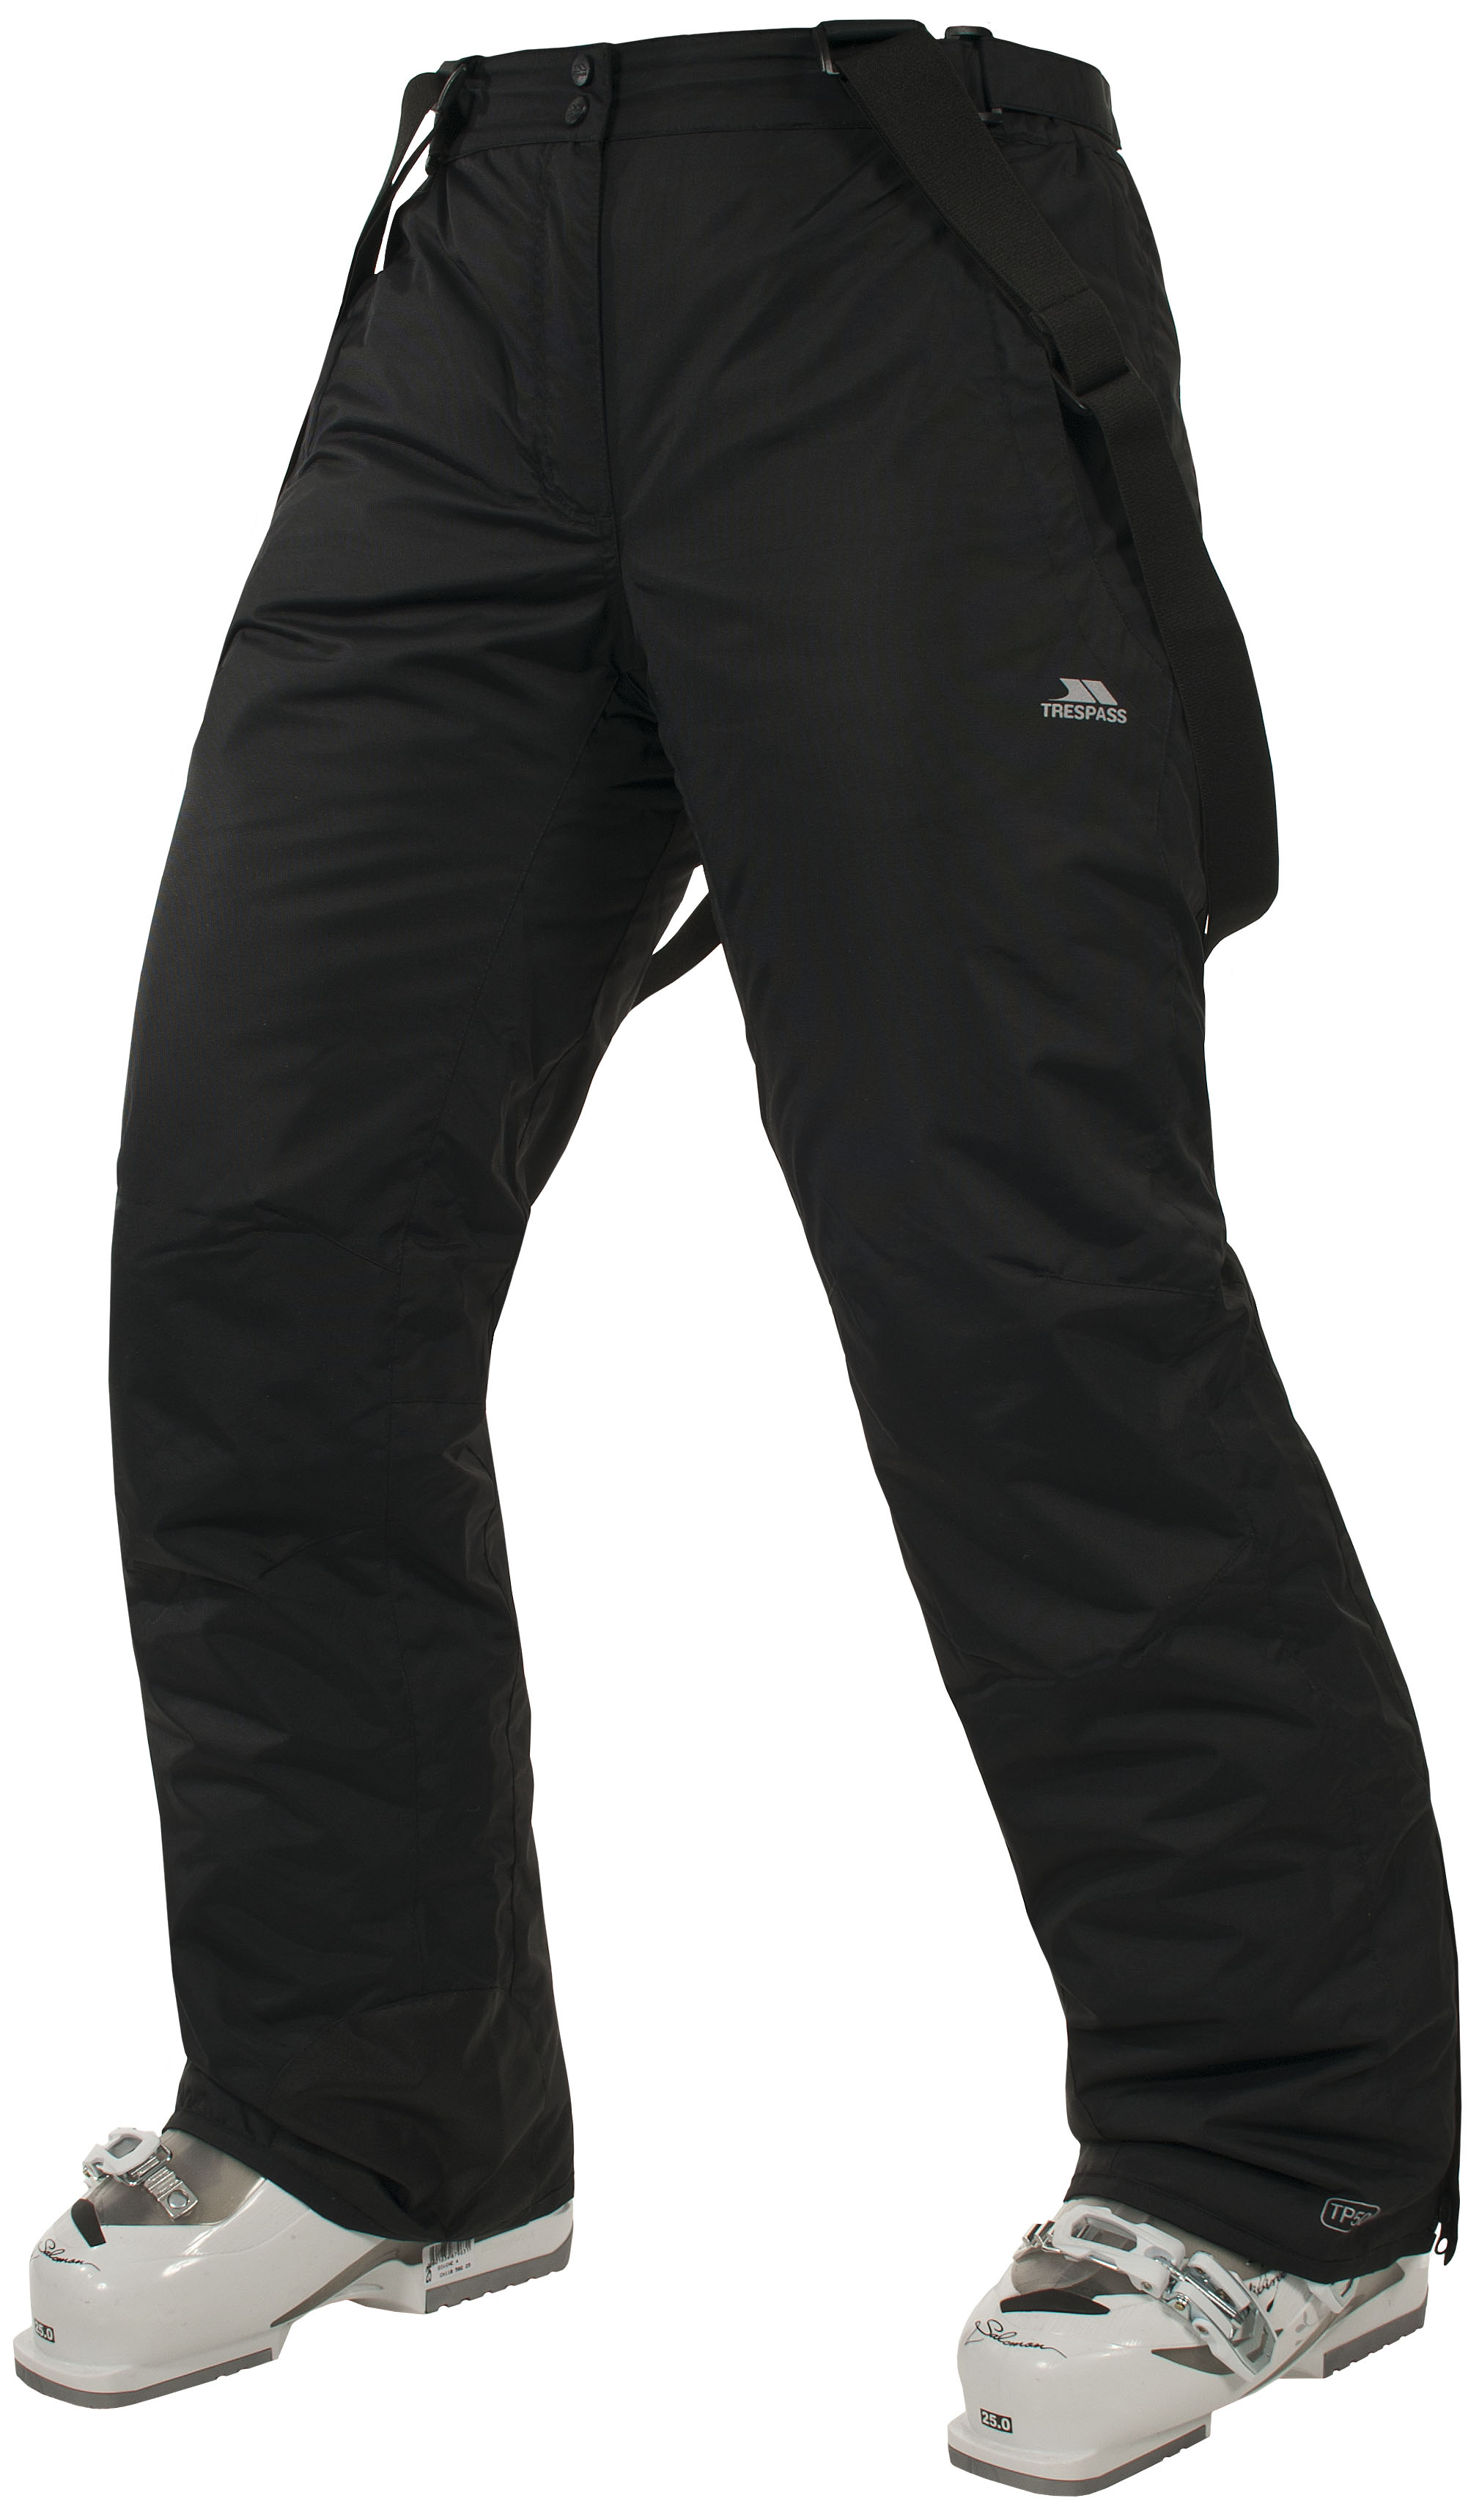 Pants BATU Women's Ski Pants